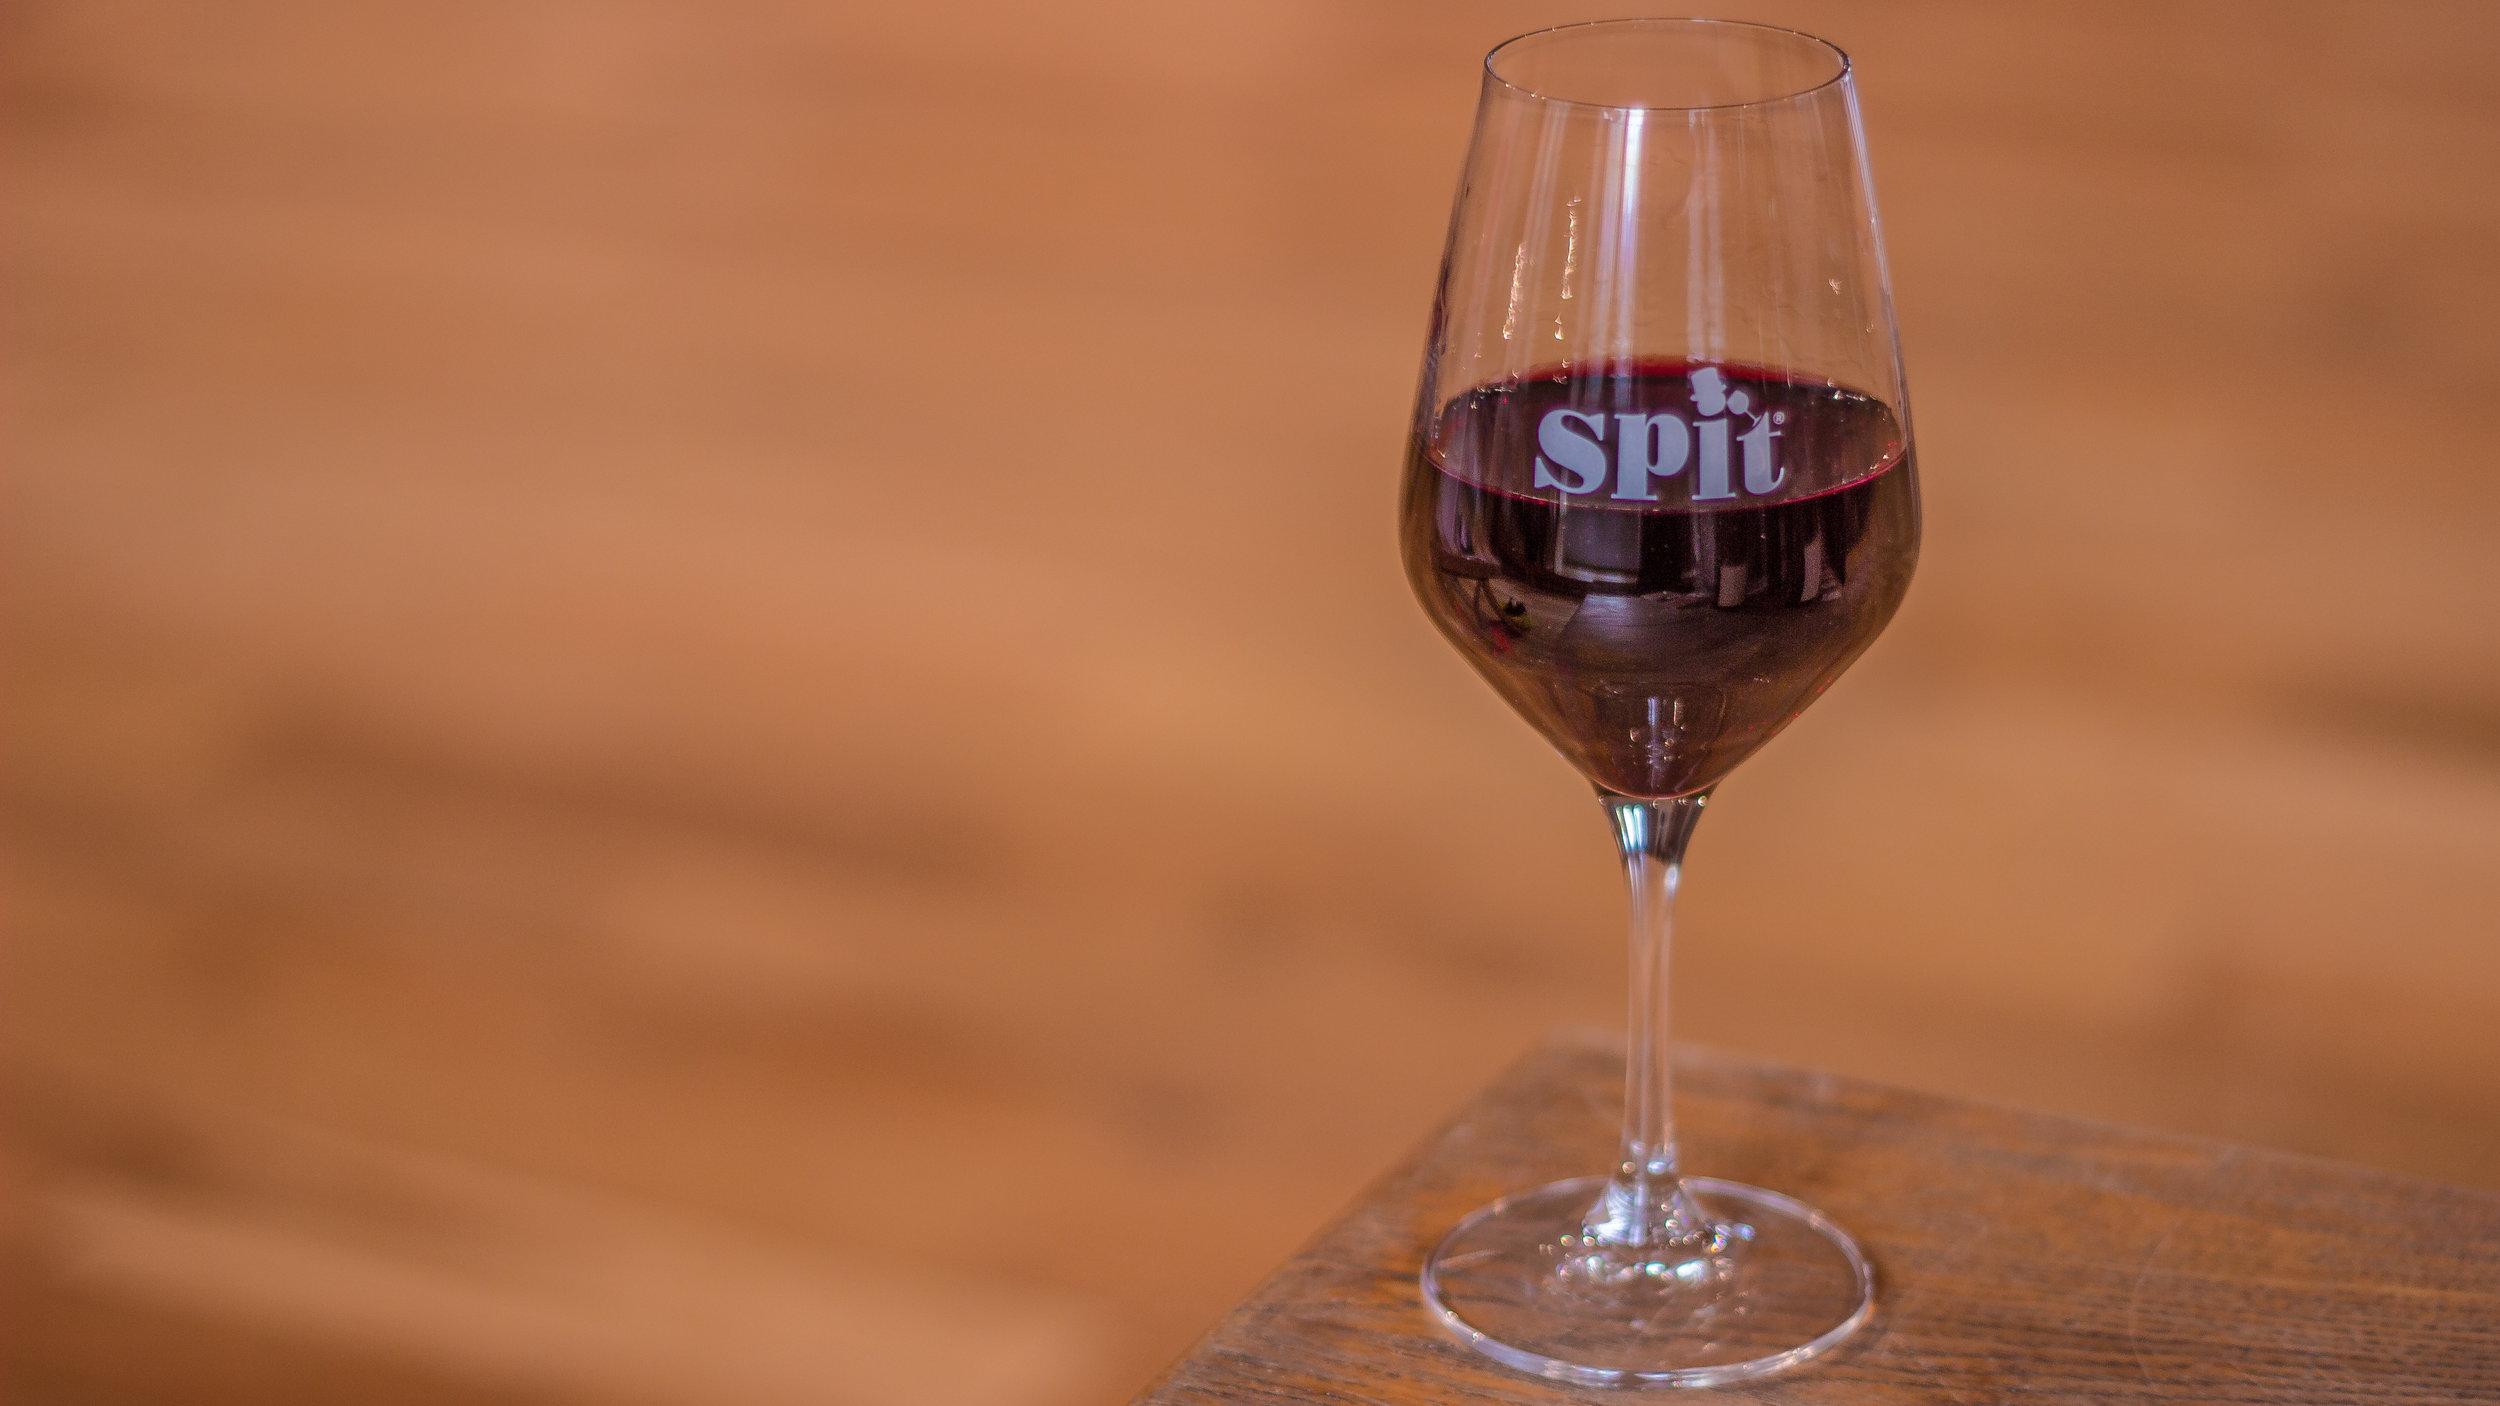 Spit Wine Fair-9874.jpg